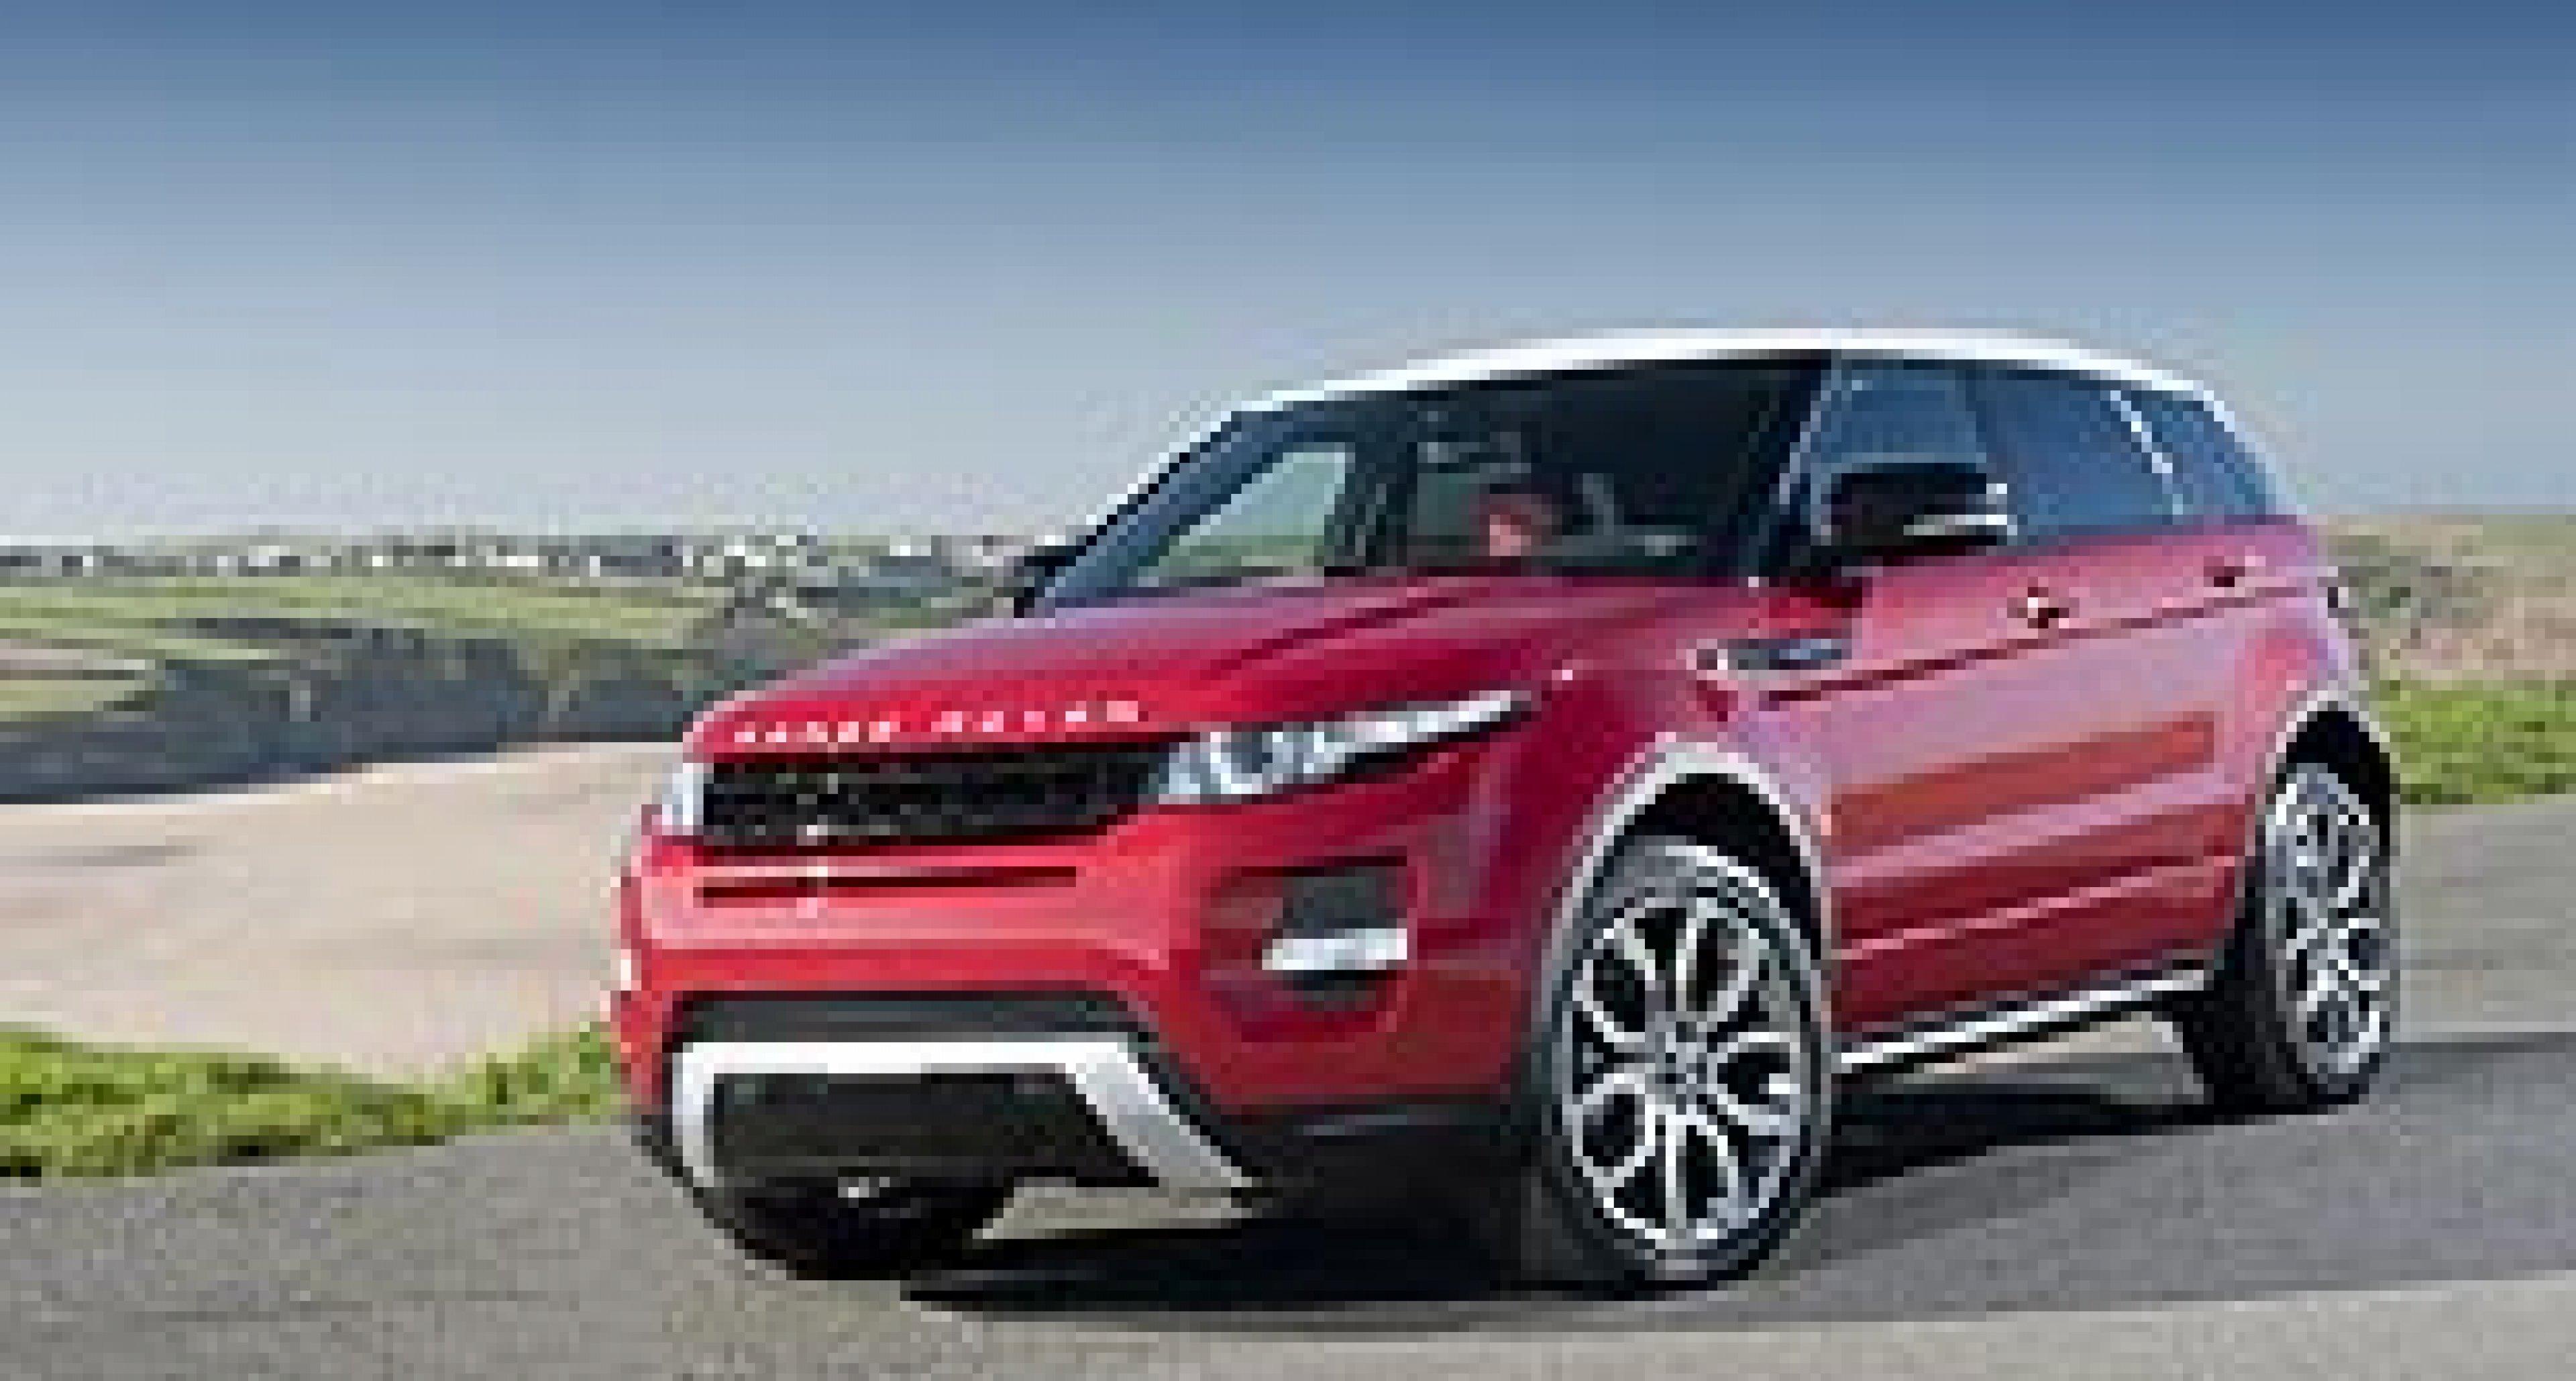 Range Rover Evoque: UK Pricing Announced